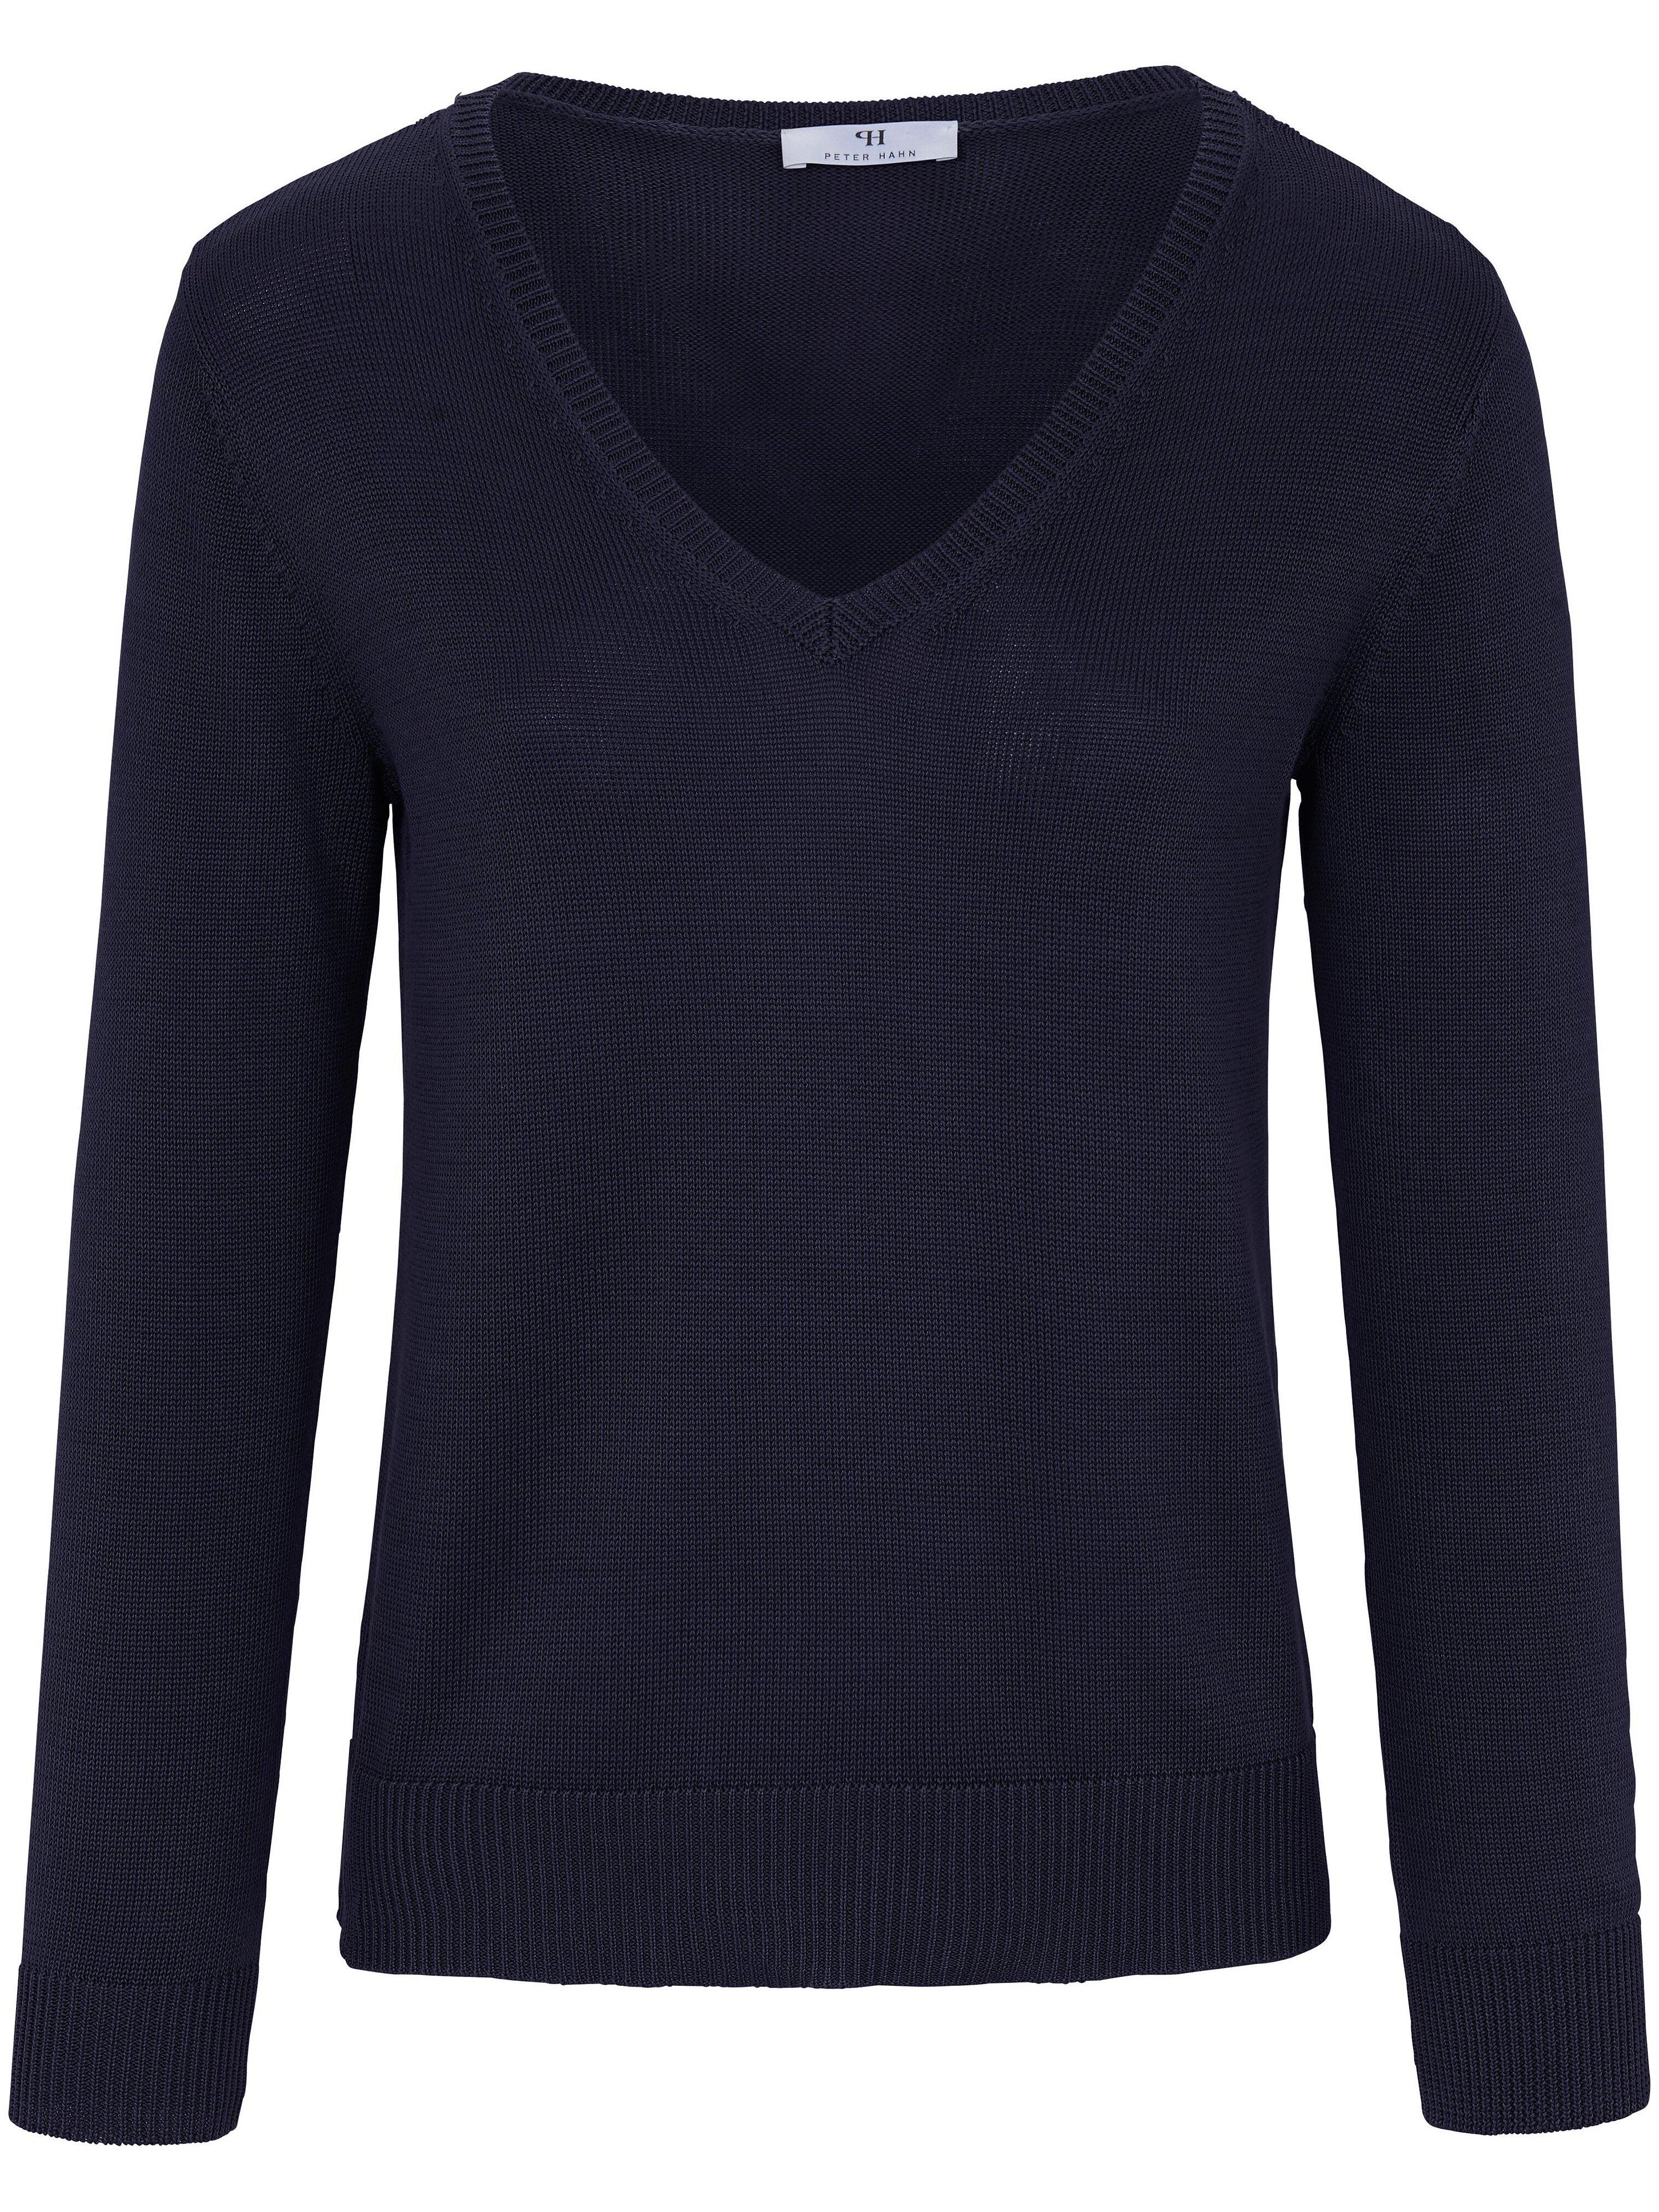 V-Pullover aus 100% SUPIMA®--Baumwolle Peter Hahn blau | Bekleidung > Pullover > V-Pullover | Peter Hahn